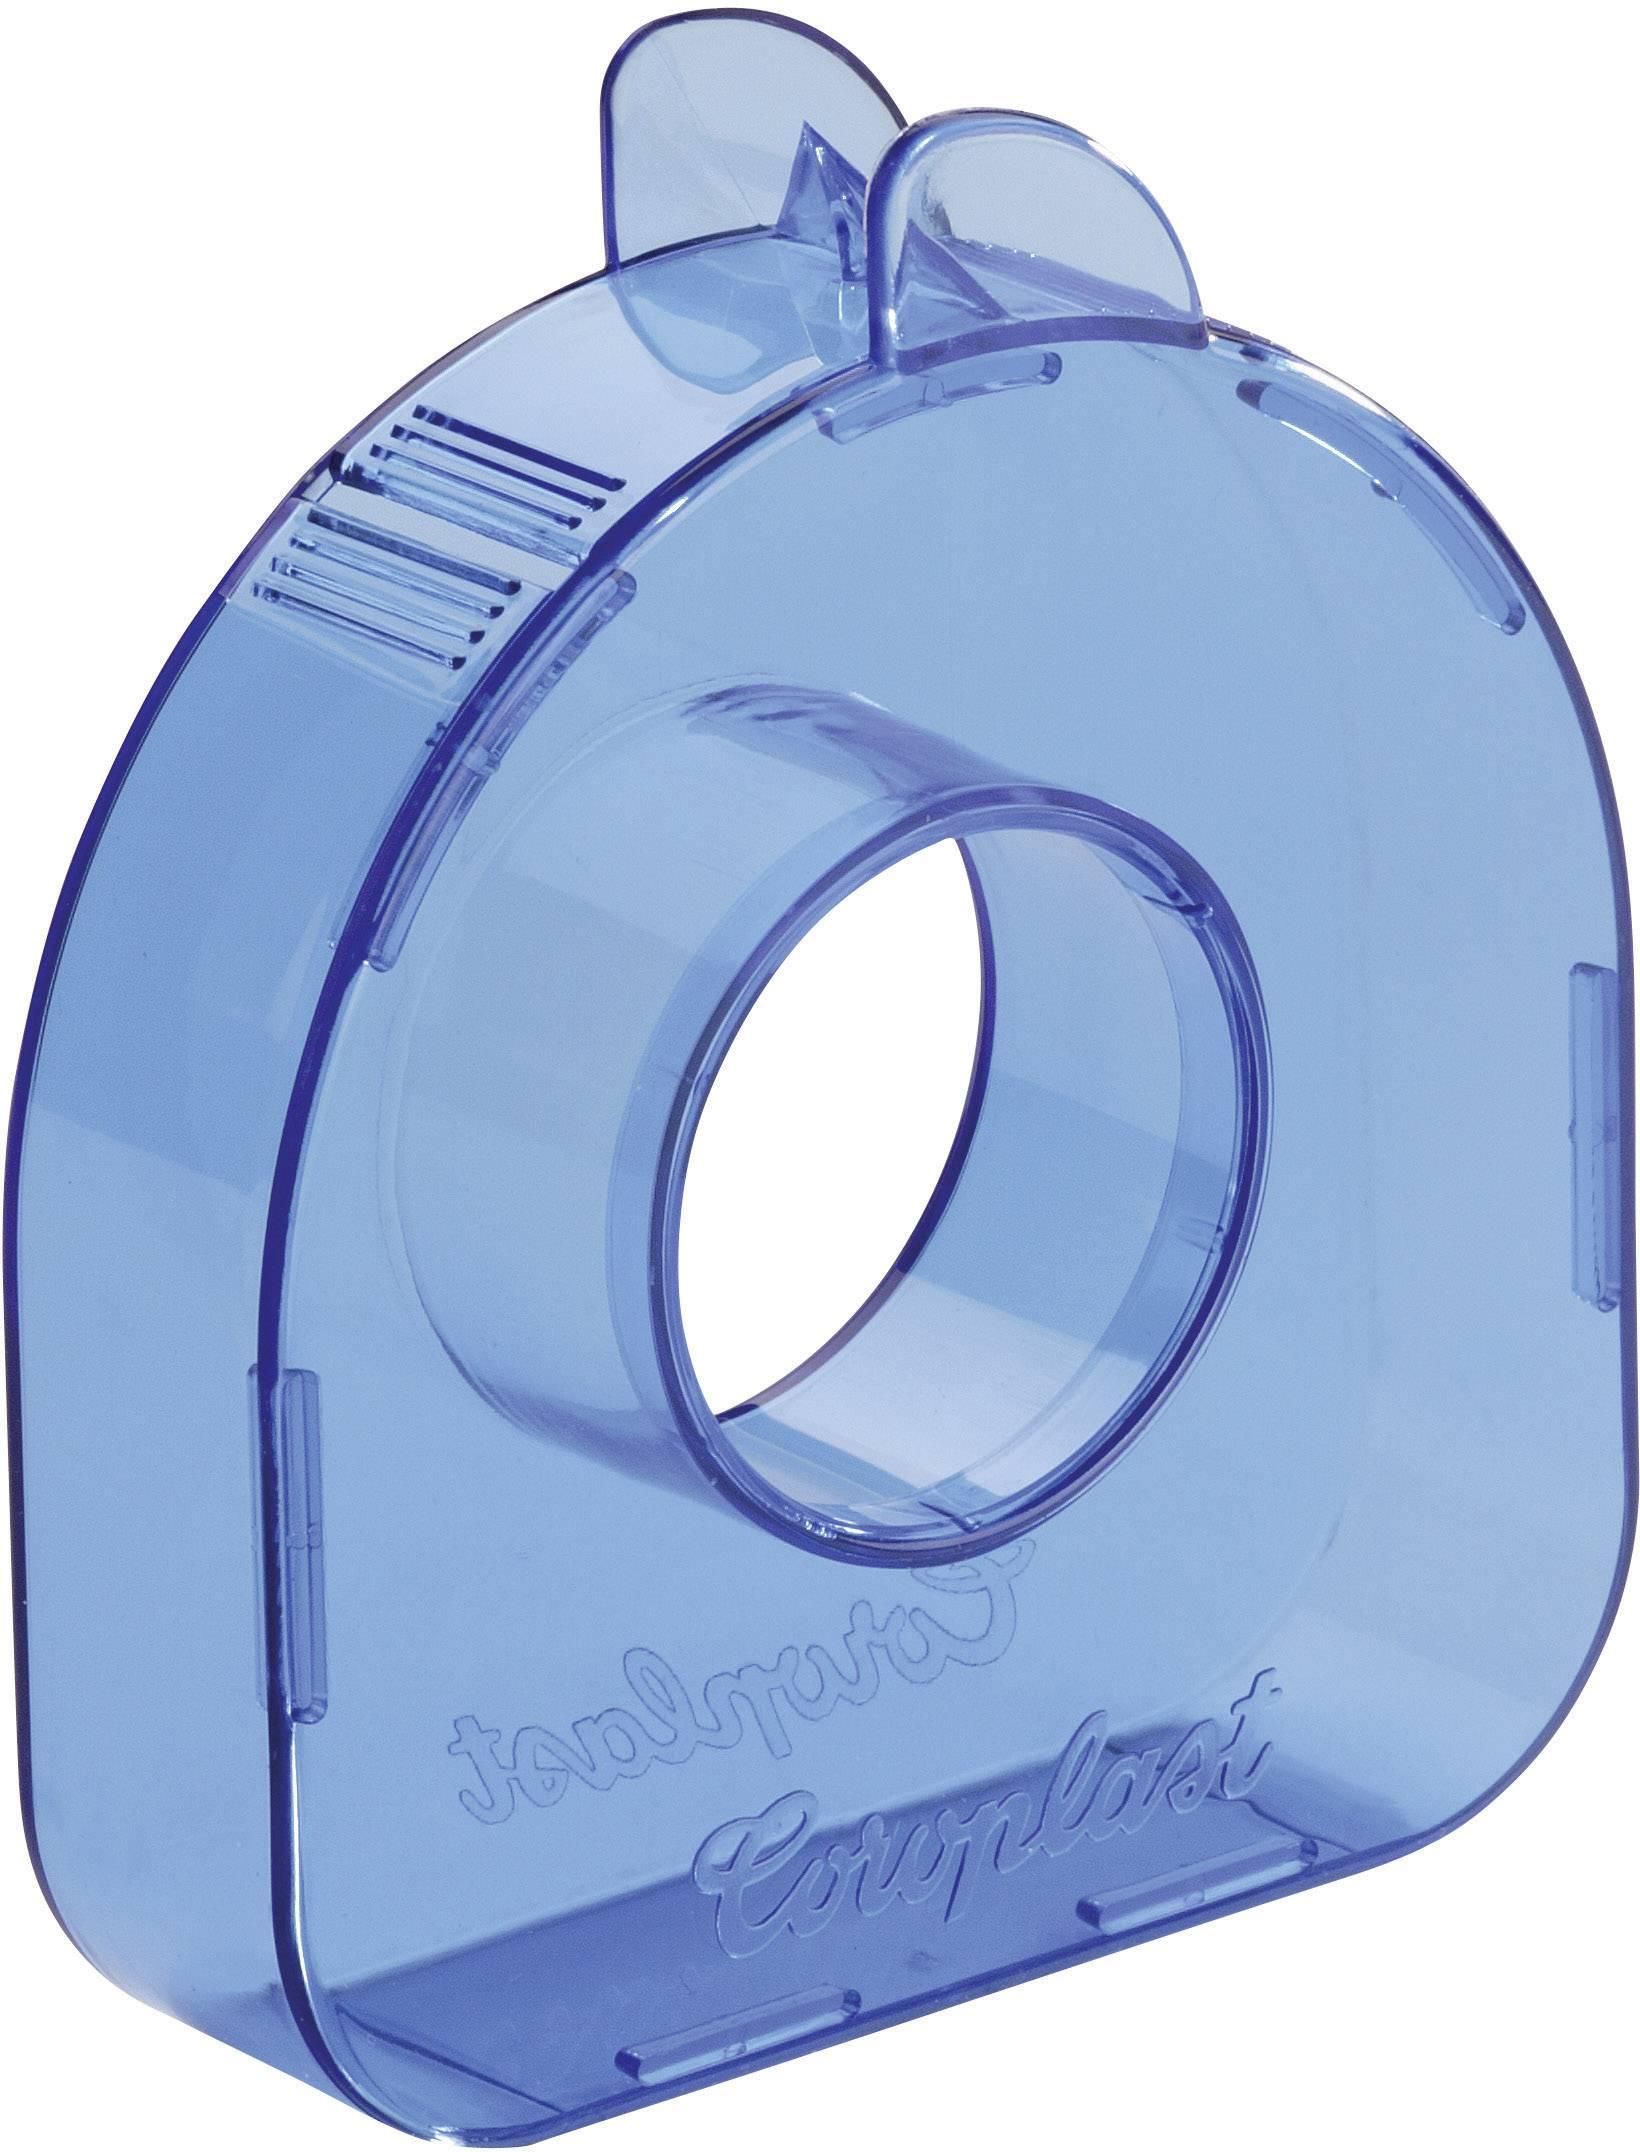 Ručný odvíjač na lepiacu pásku Coroplast 41224;41224, 22 mm, 25 m